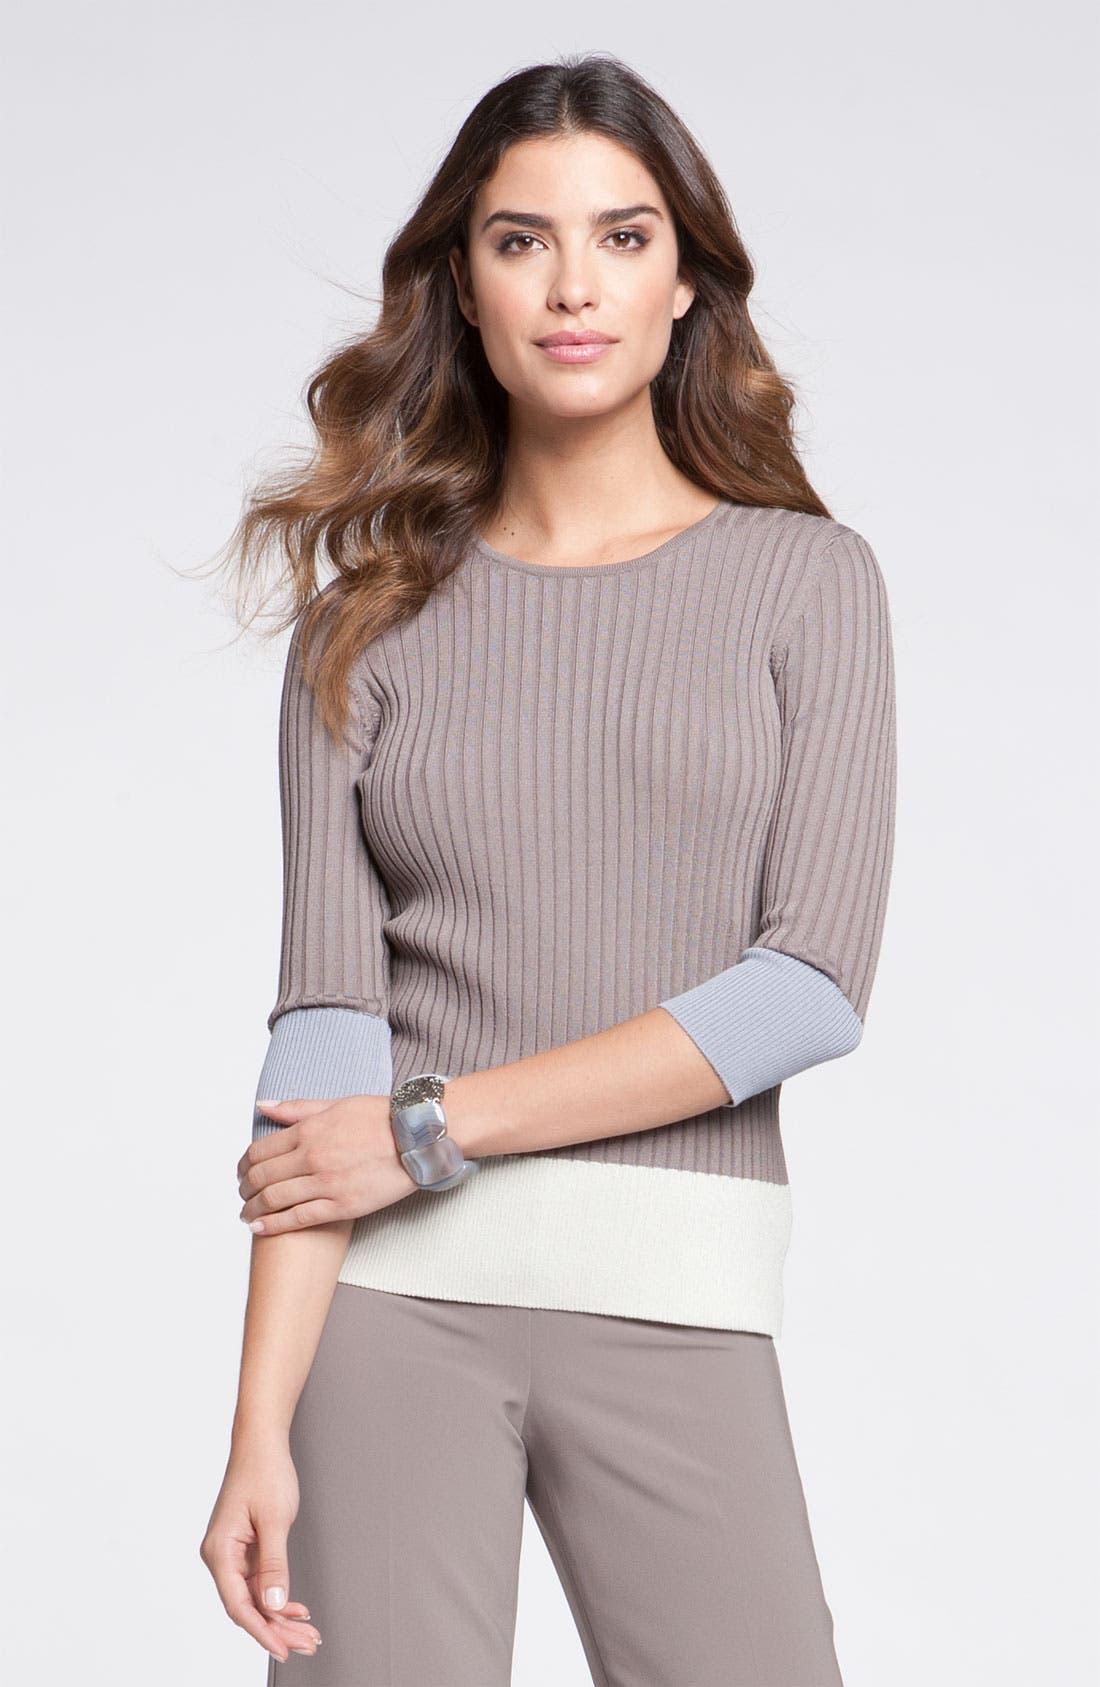 Alternate Image 1 Selected - St. John Yellow Label Colorblock Rib Knit Sweater